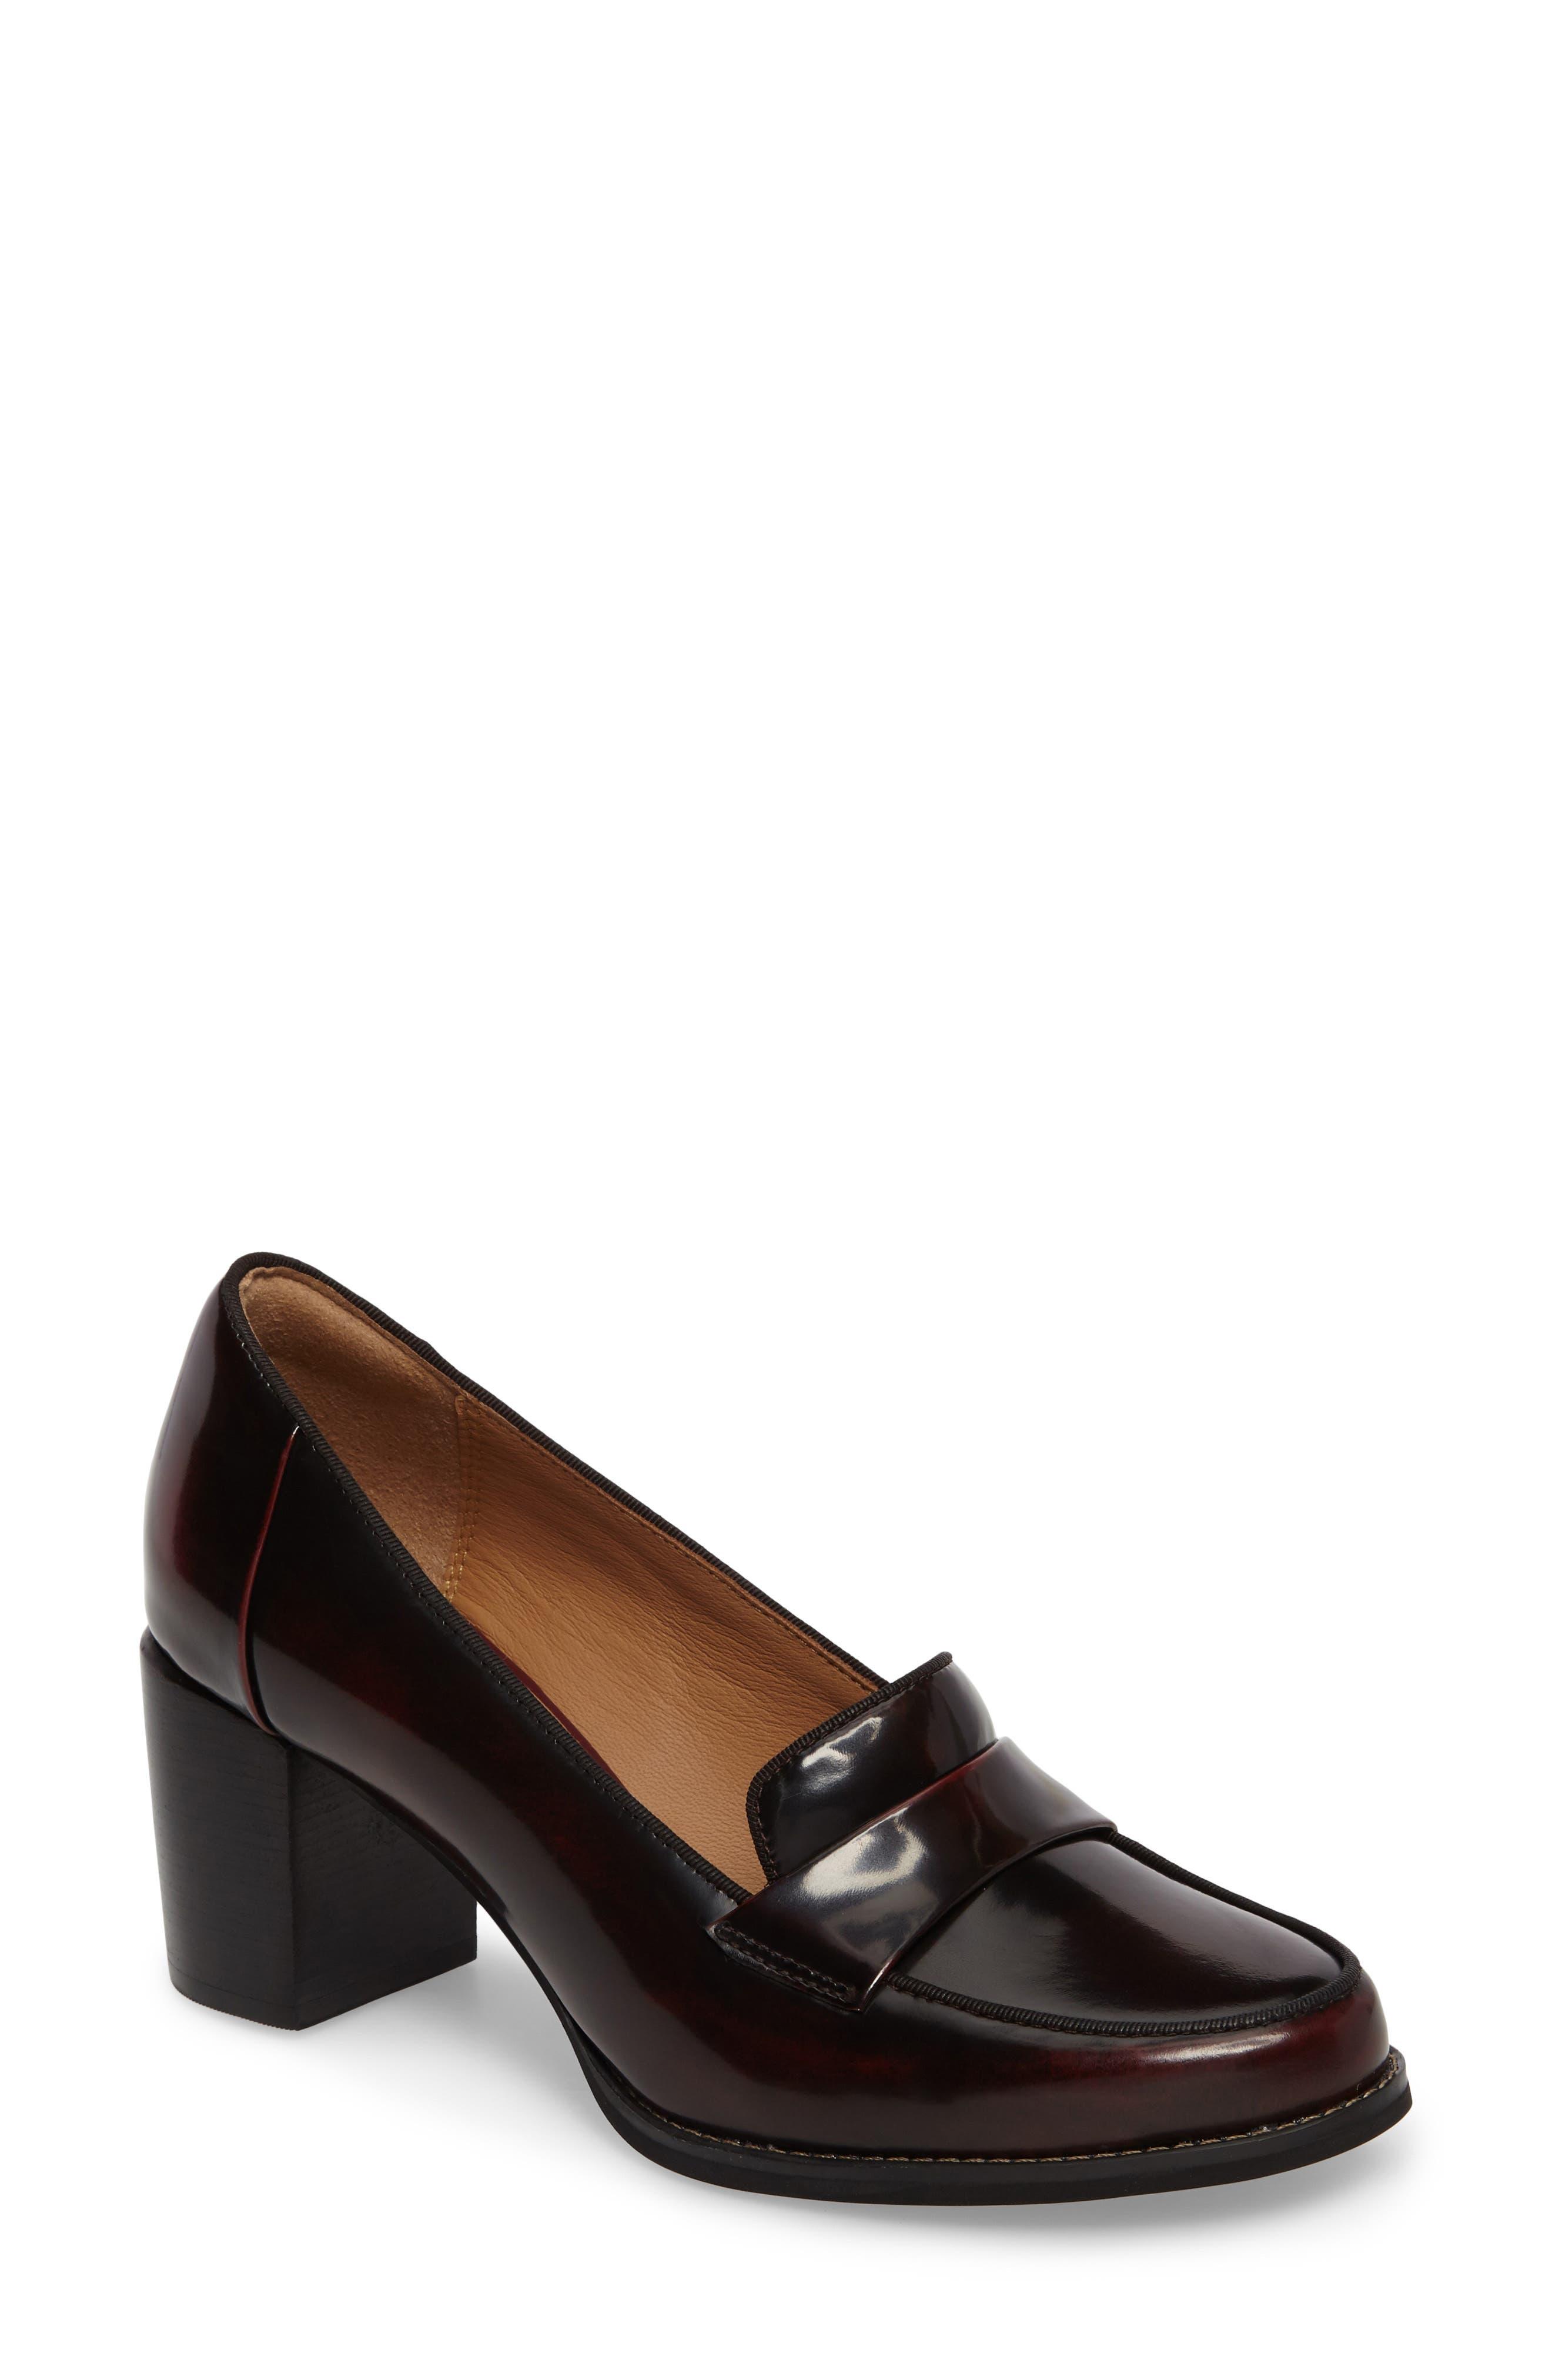 Tarah Grace Pump,                         Main,                         color, Burgundy Leather